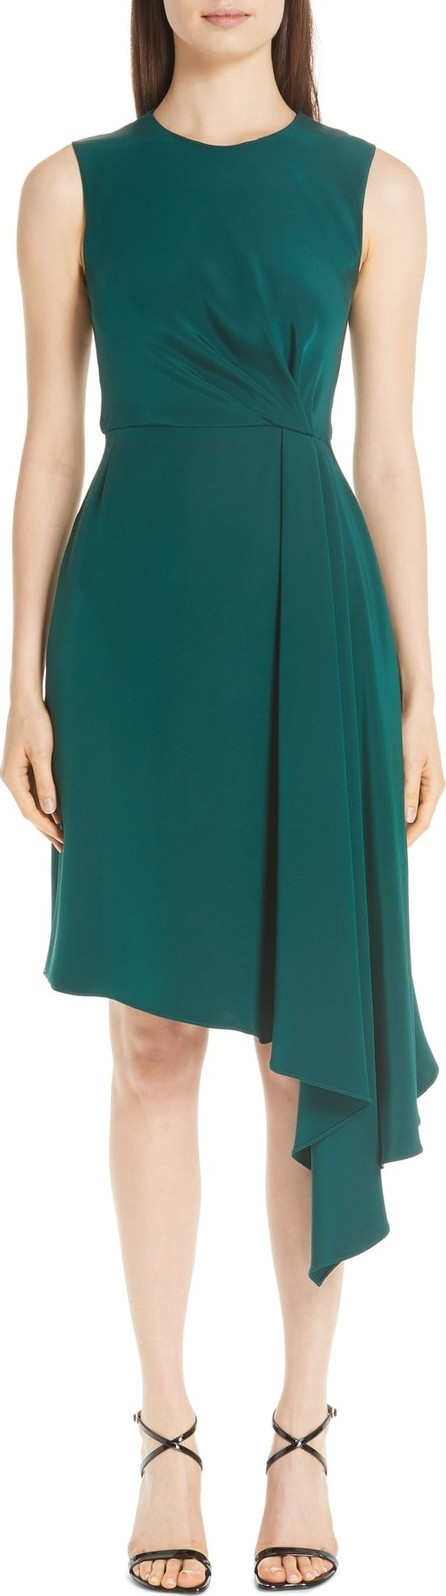 Adam Lippes Silk Crepe Side Drape Dress